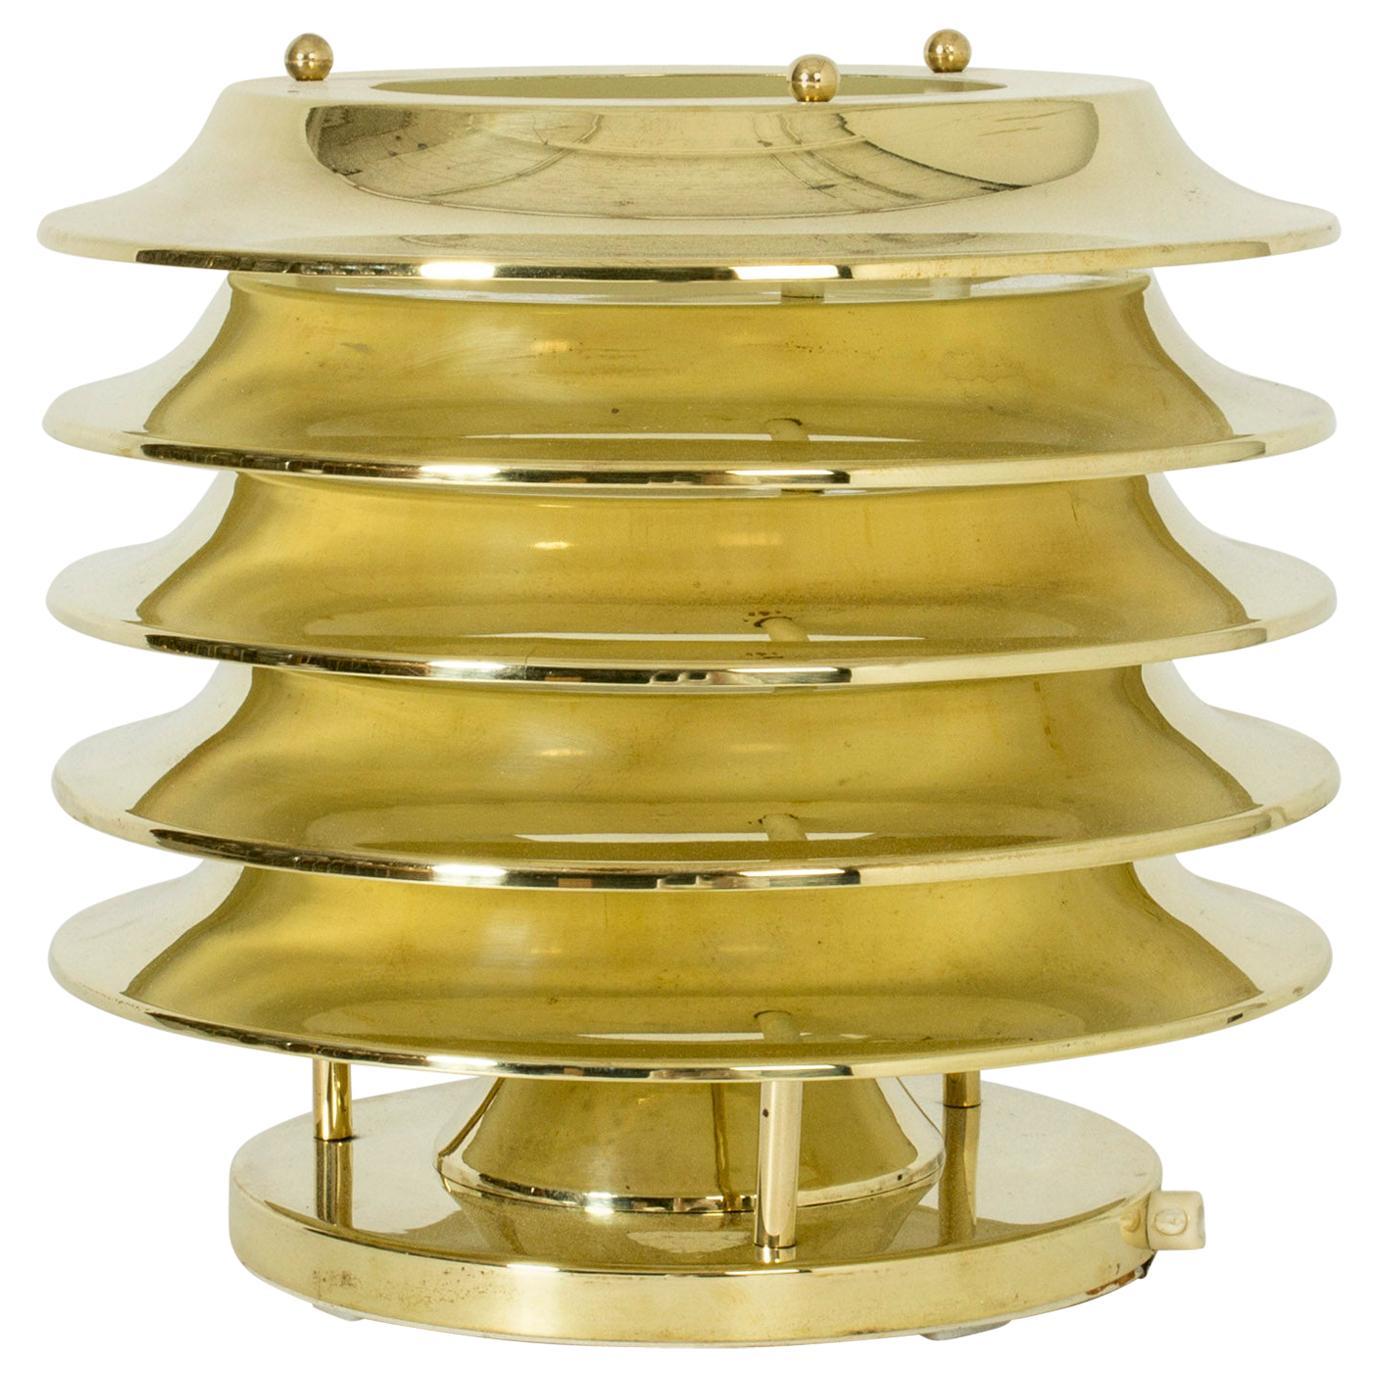 Brass Table Lamp by Kai Ruokonen for Orno, Finland, 1960s